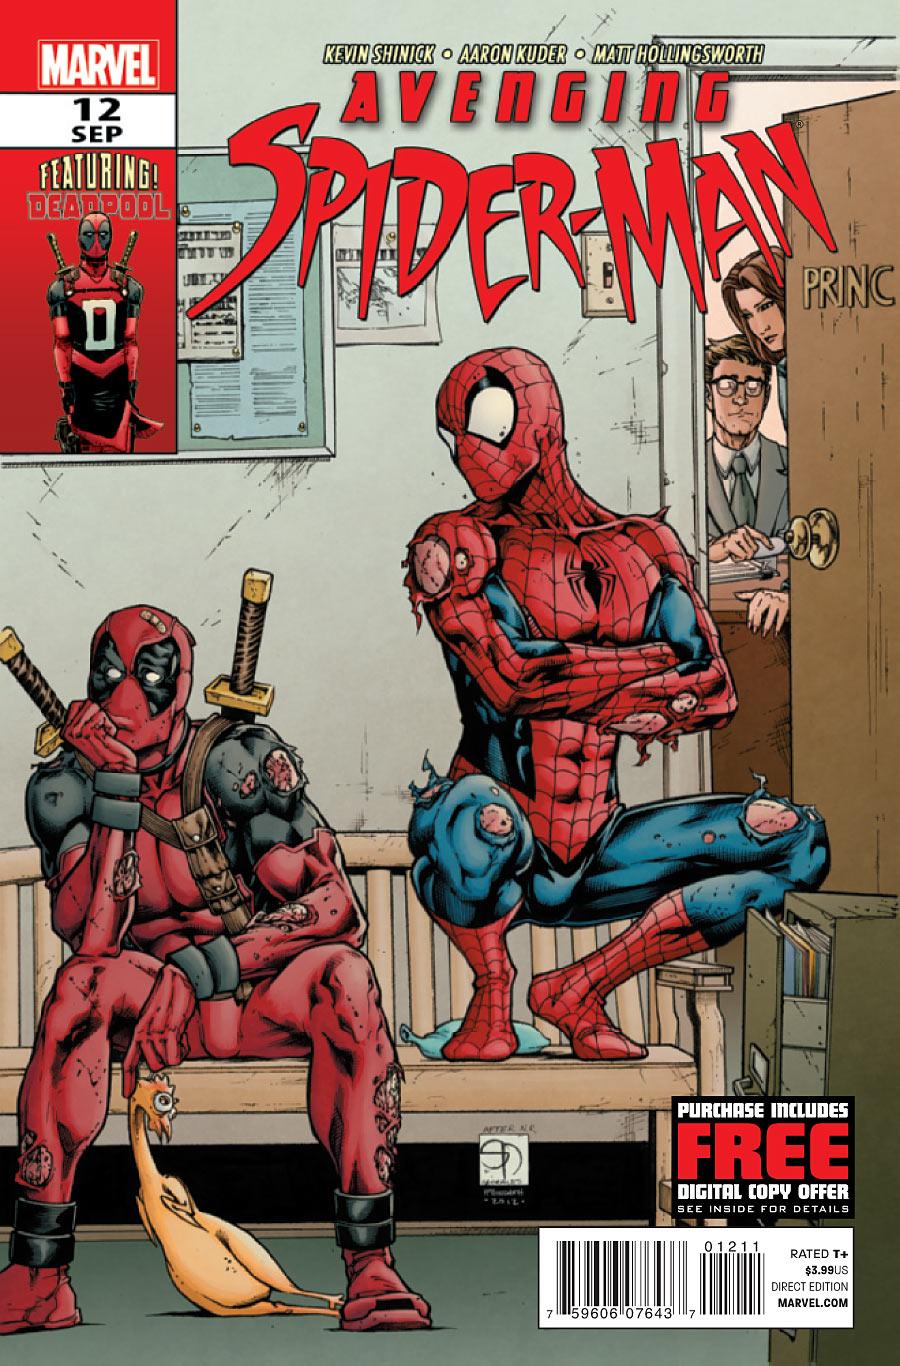 Avenging Spider-Man Vol 1 12 - Marvel Comics Database